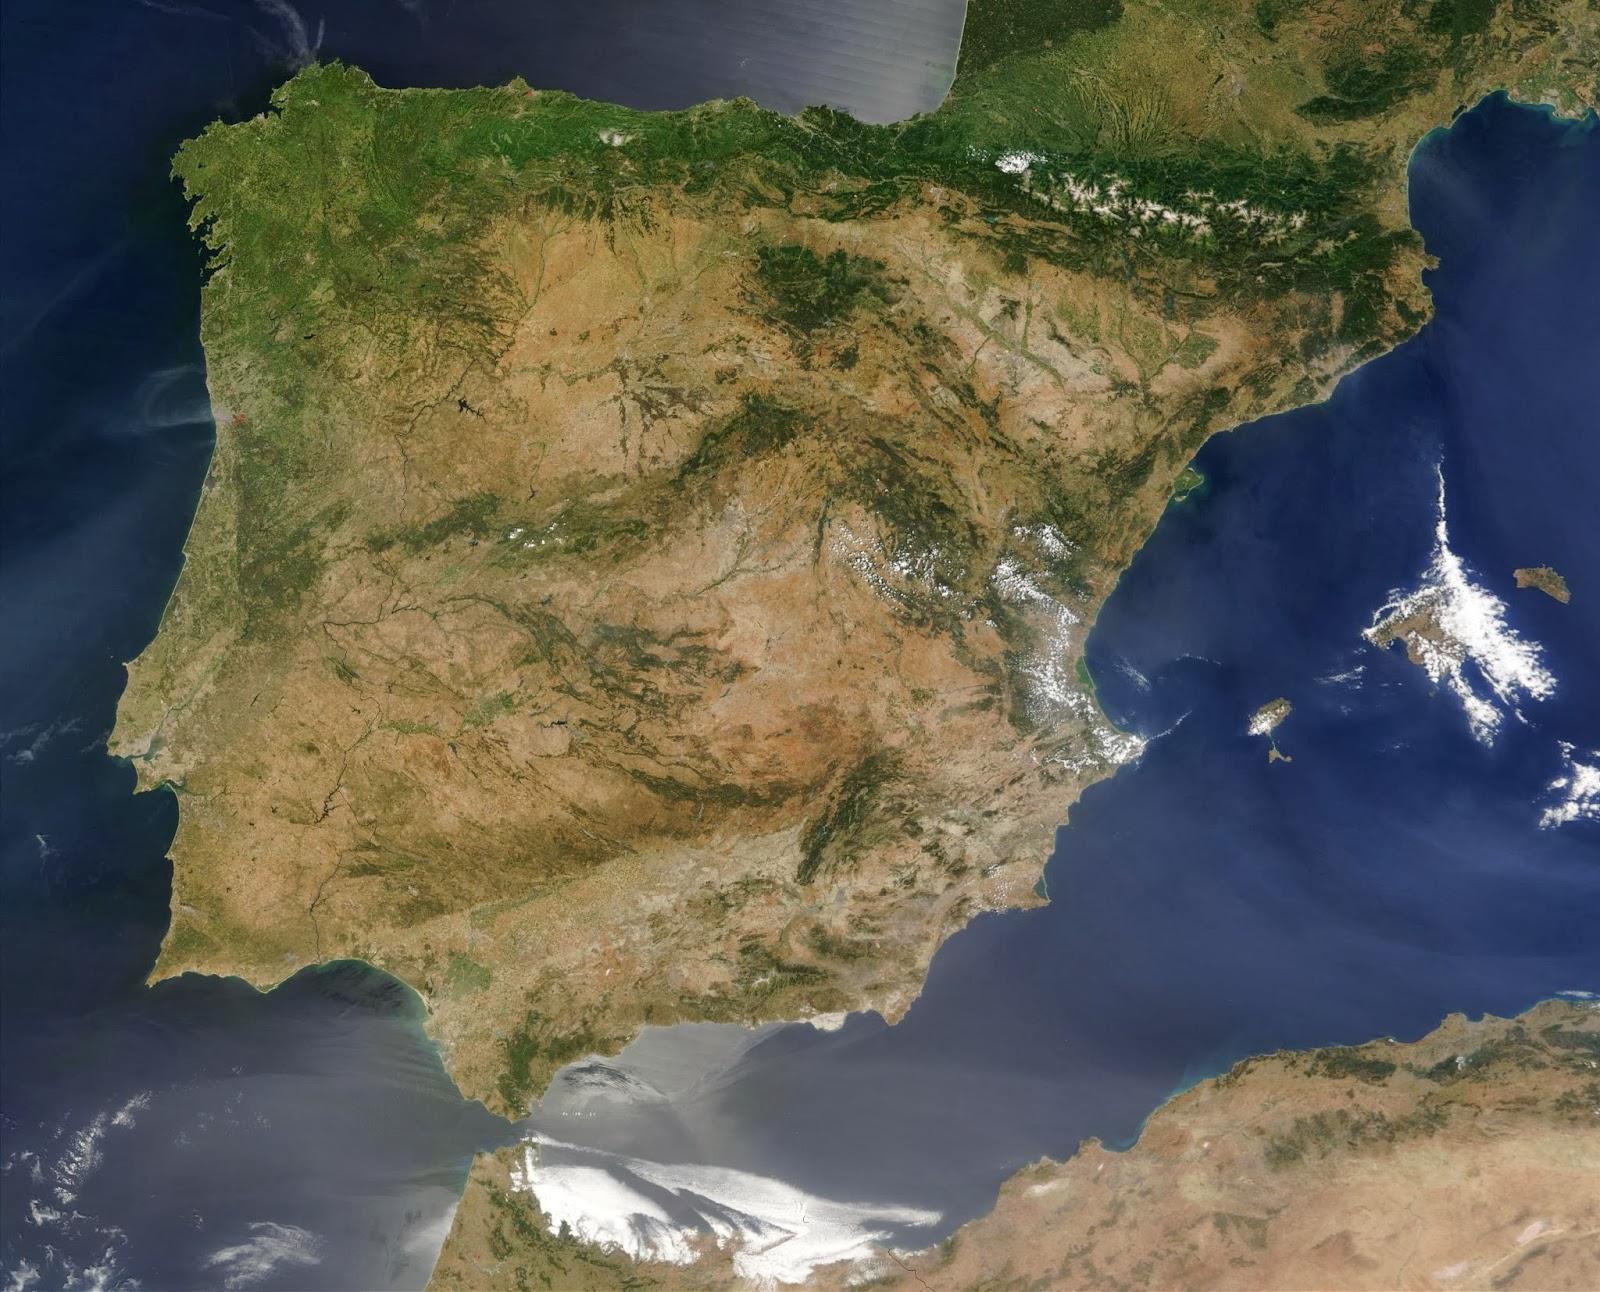 Spain Ceuta And Melilla Ceuta And Melilla